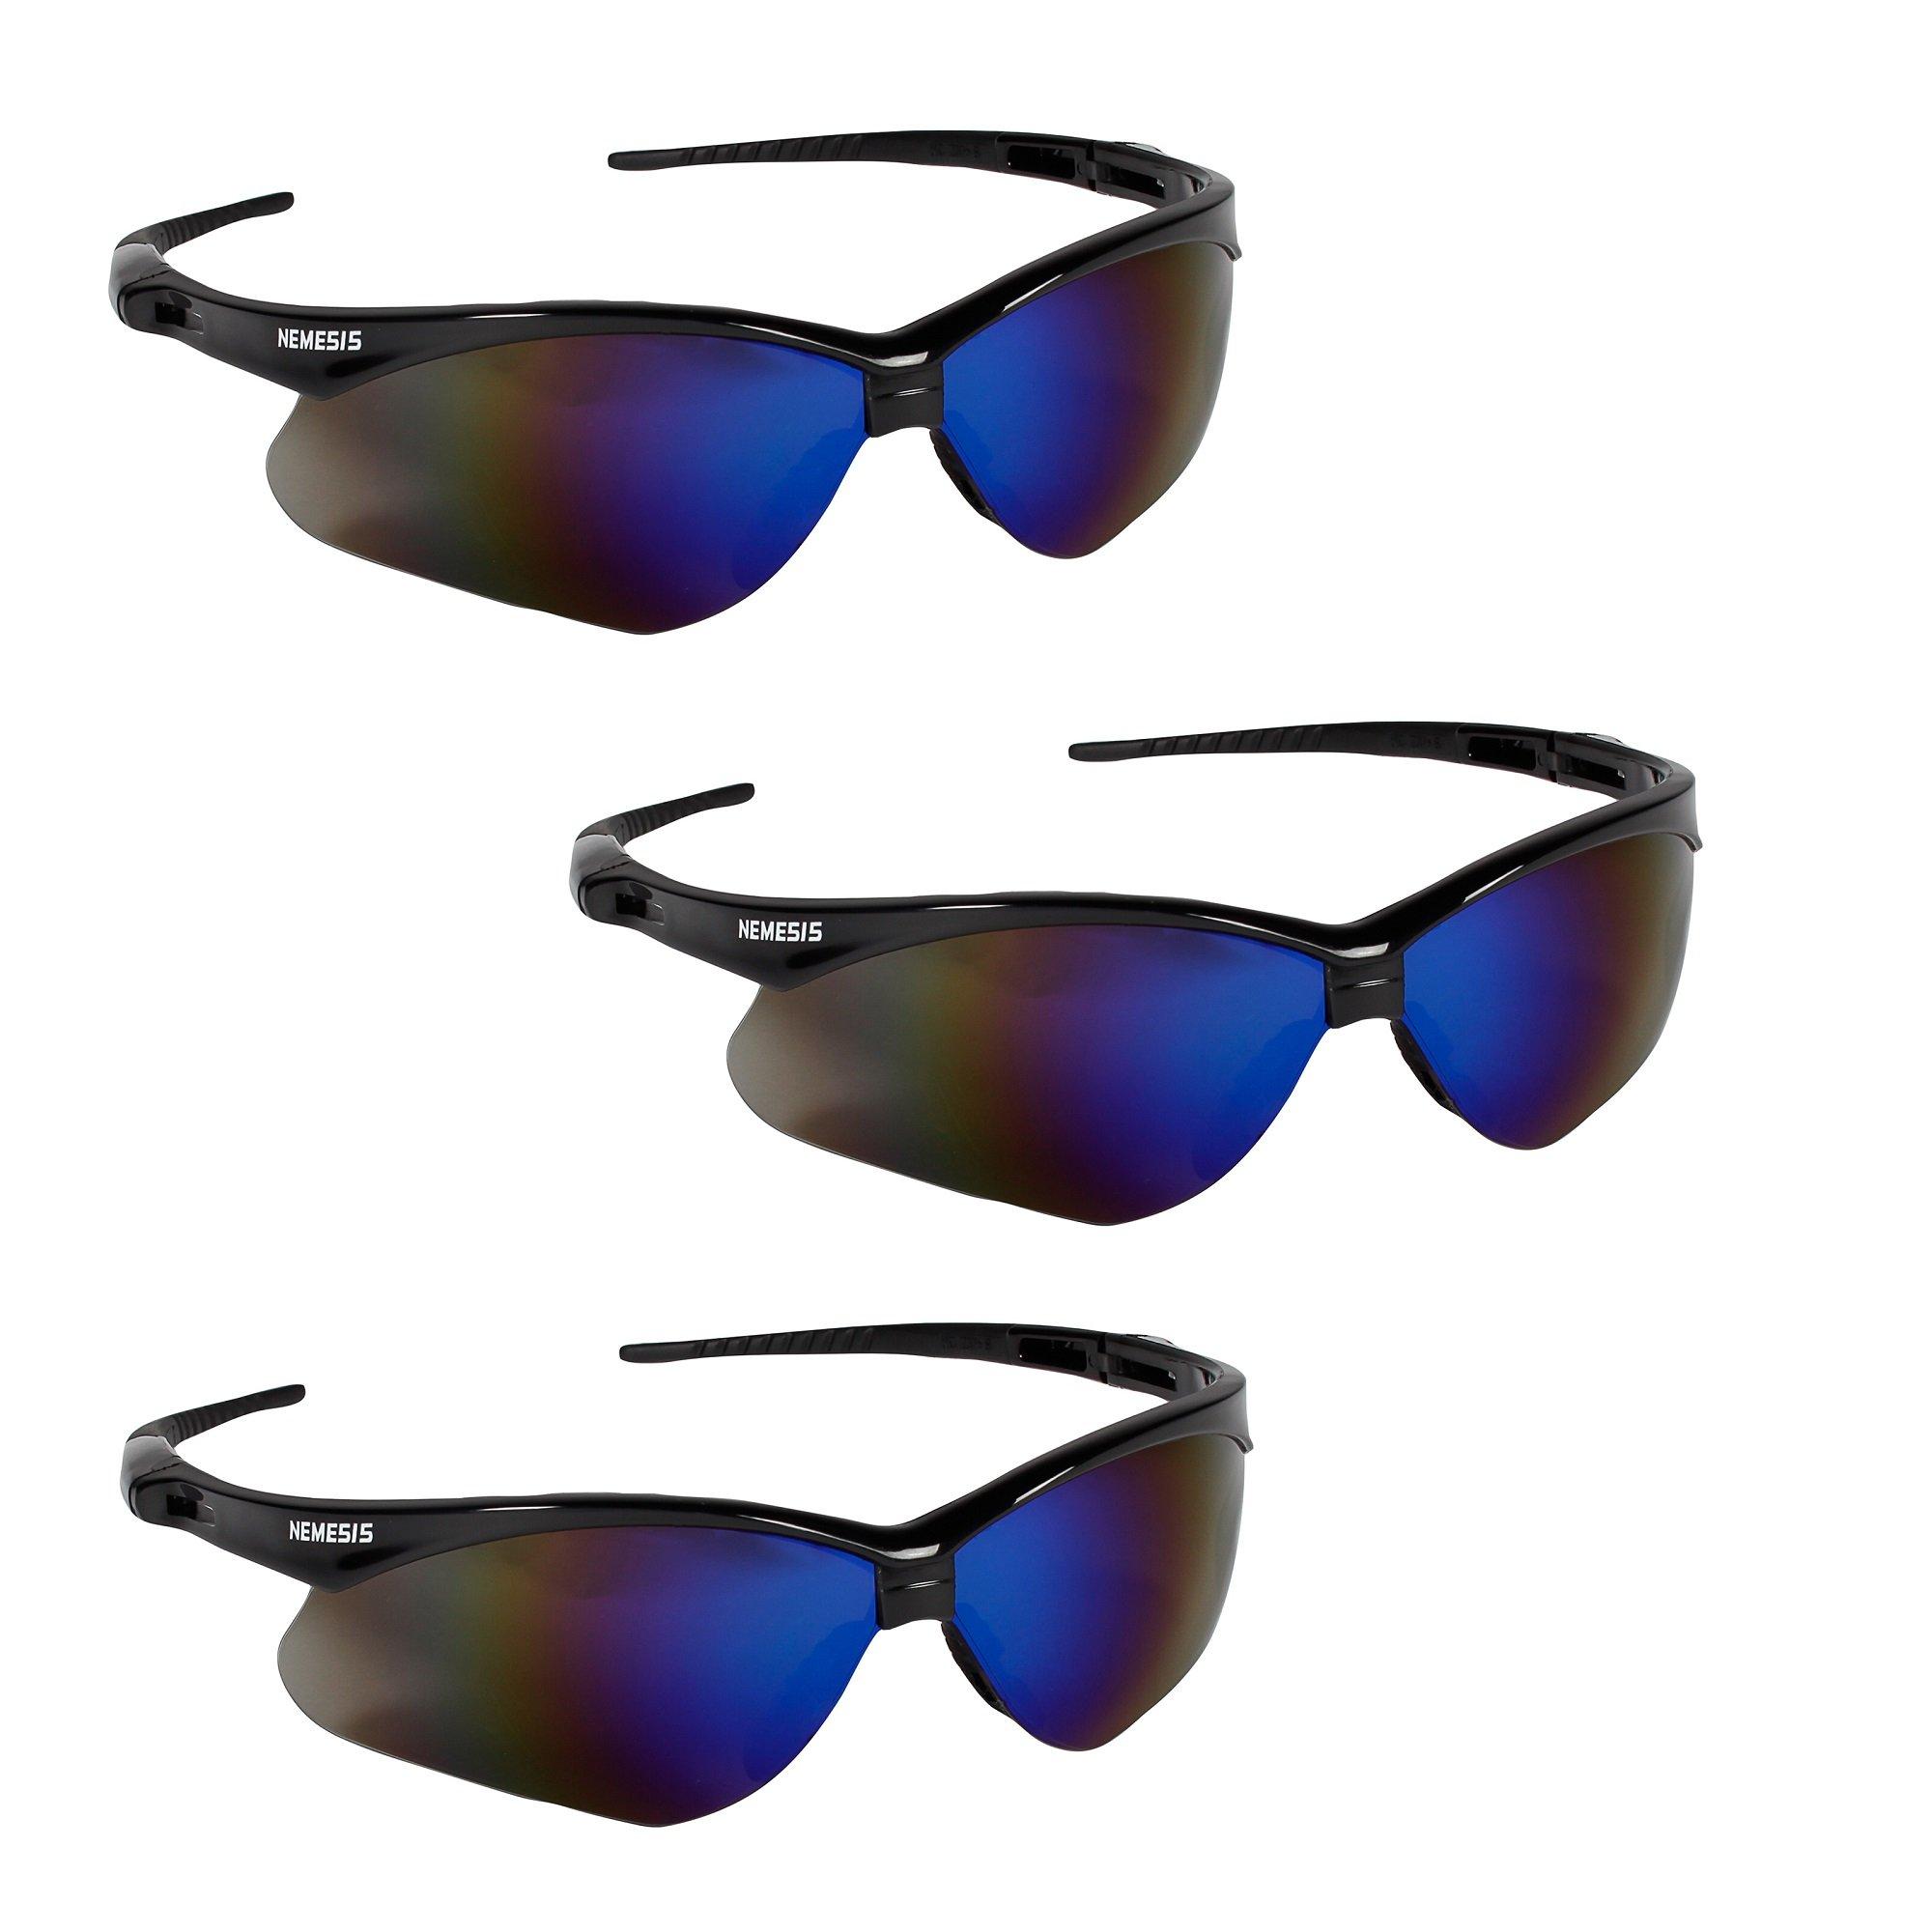 Jackson Safety V30 14481 Nemesis Safety Glasses 3000358 (3 Pair) (Black Frame with Blue Mirror Lens)